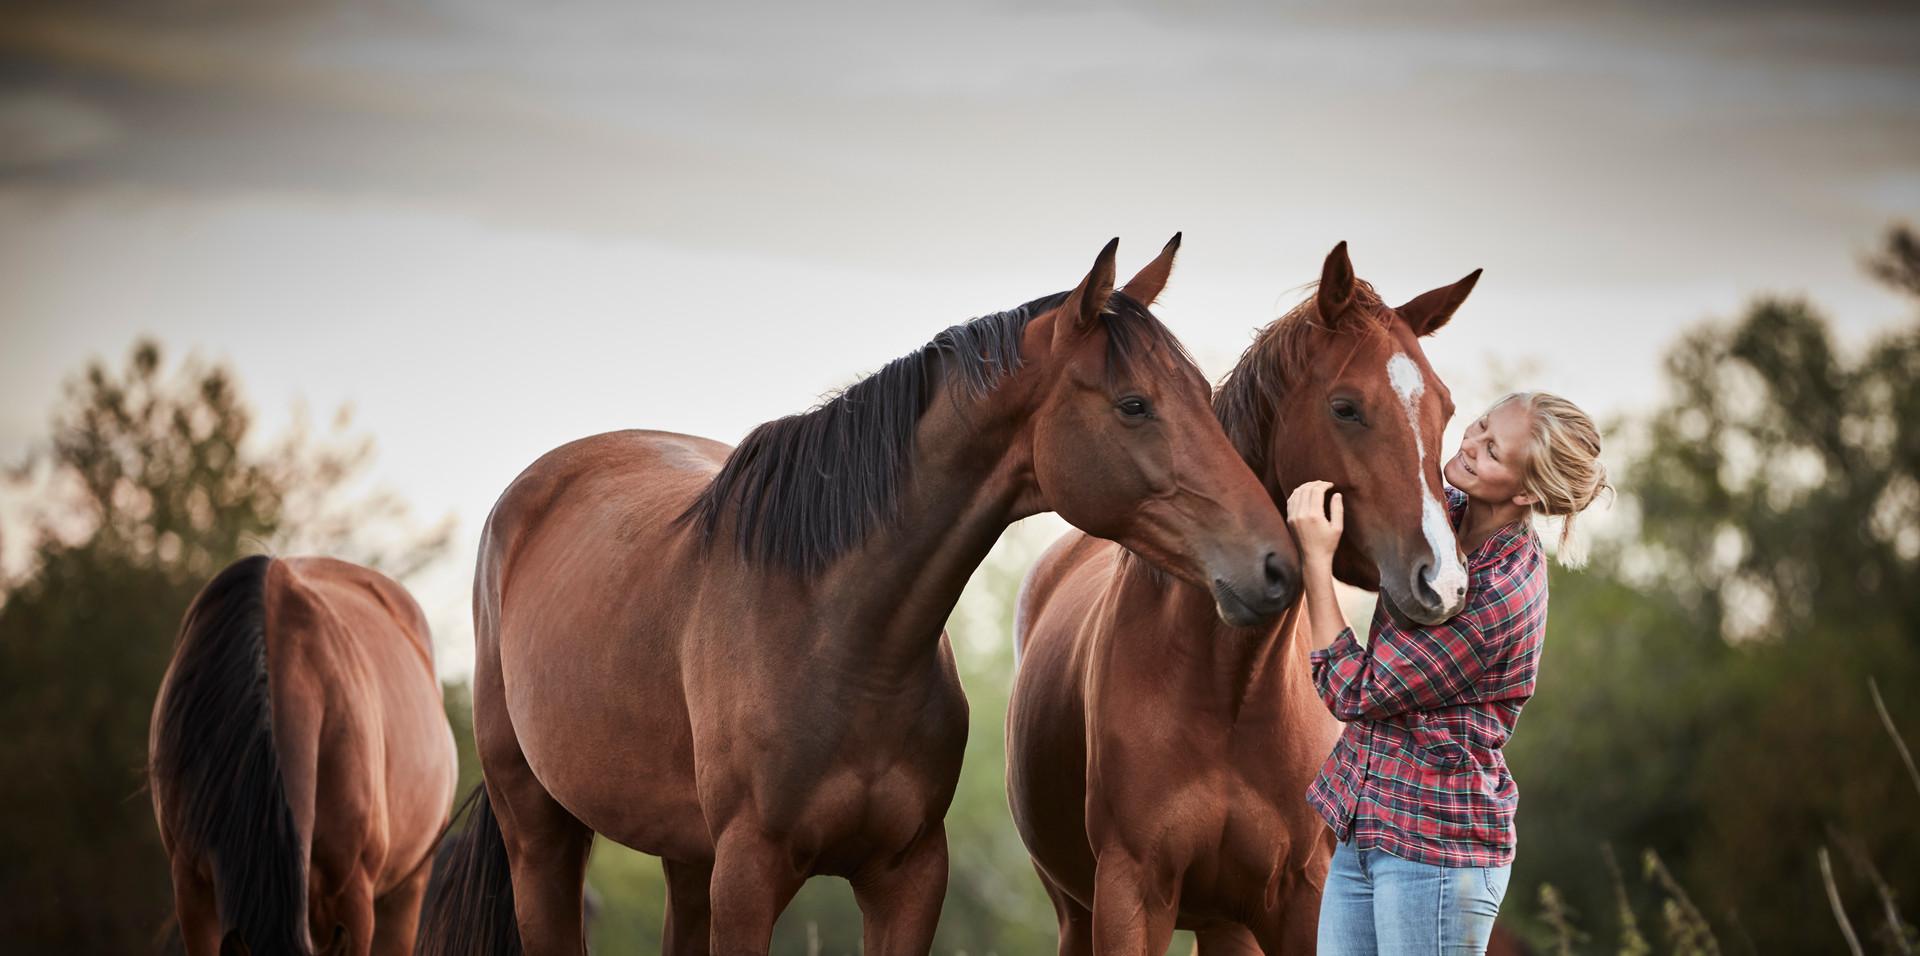 20200822_RAPIDSROCK_Horses__P3A4310.jpg